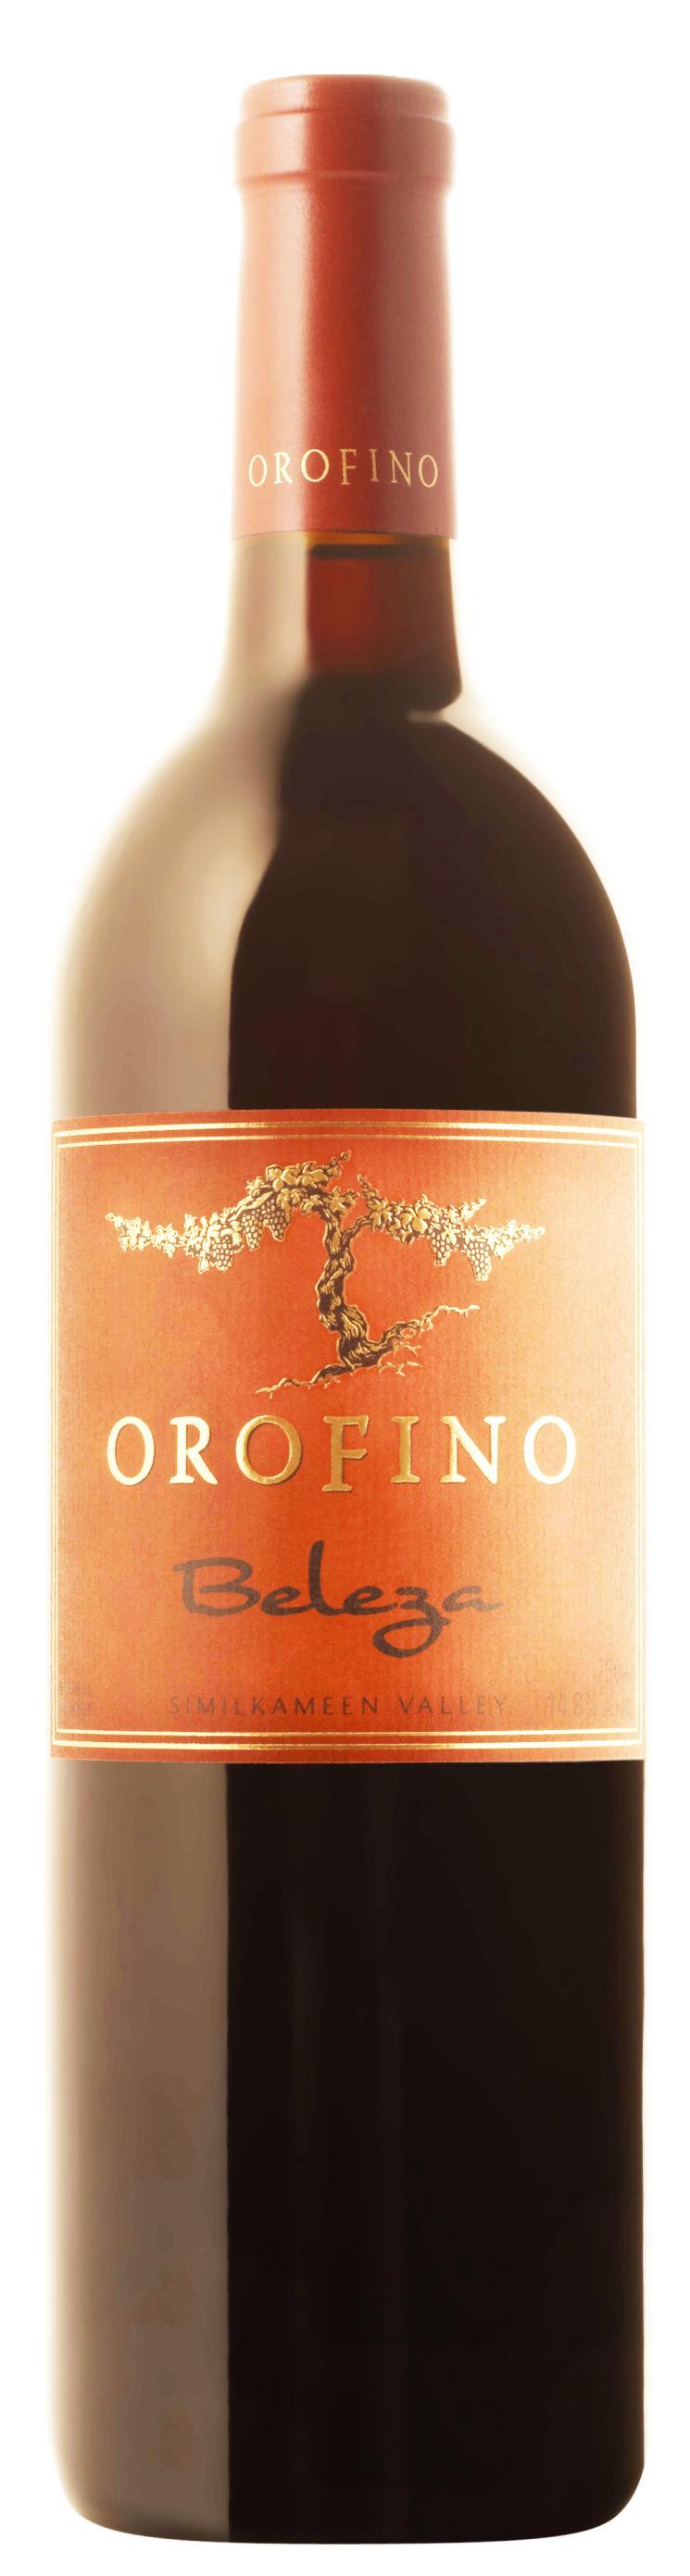 Orofino 2016 Beleza ($34)